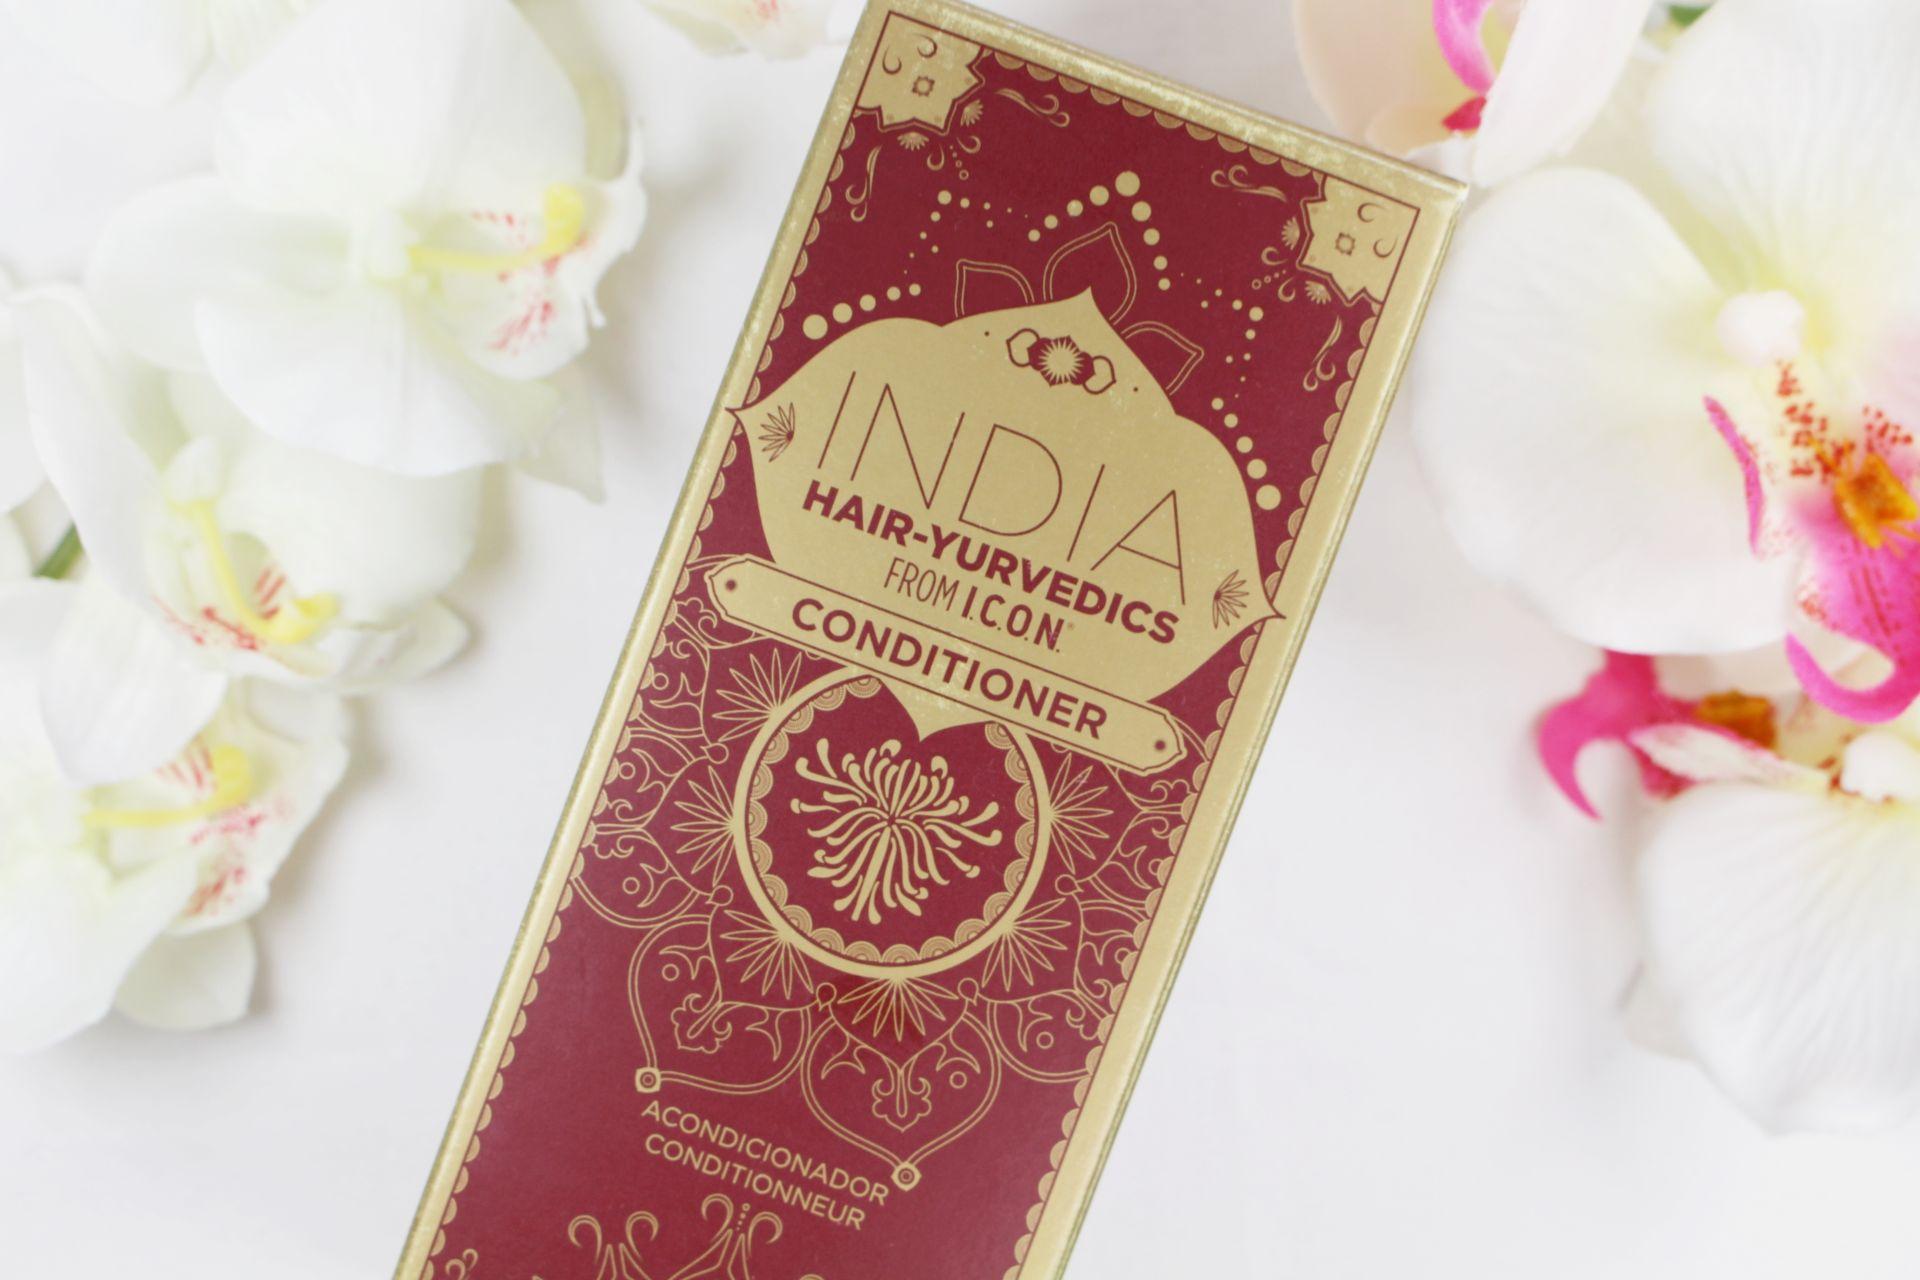 ICON India Conditioner, ICON India Erfahrungen, ICON India Oil, Haarpflege Silikone, Super Twins Annalena und Magdalena